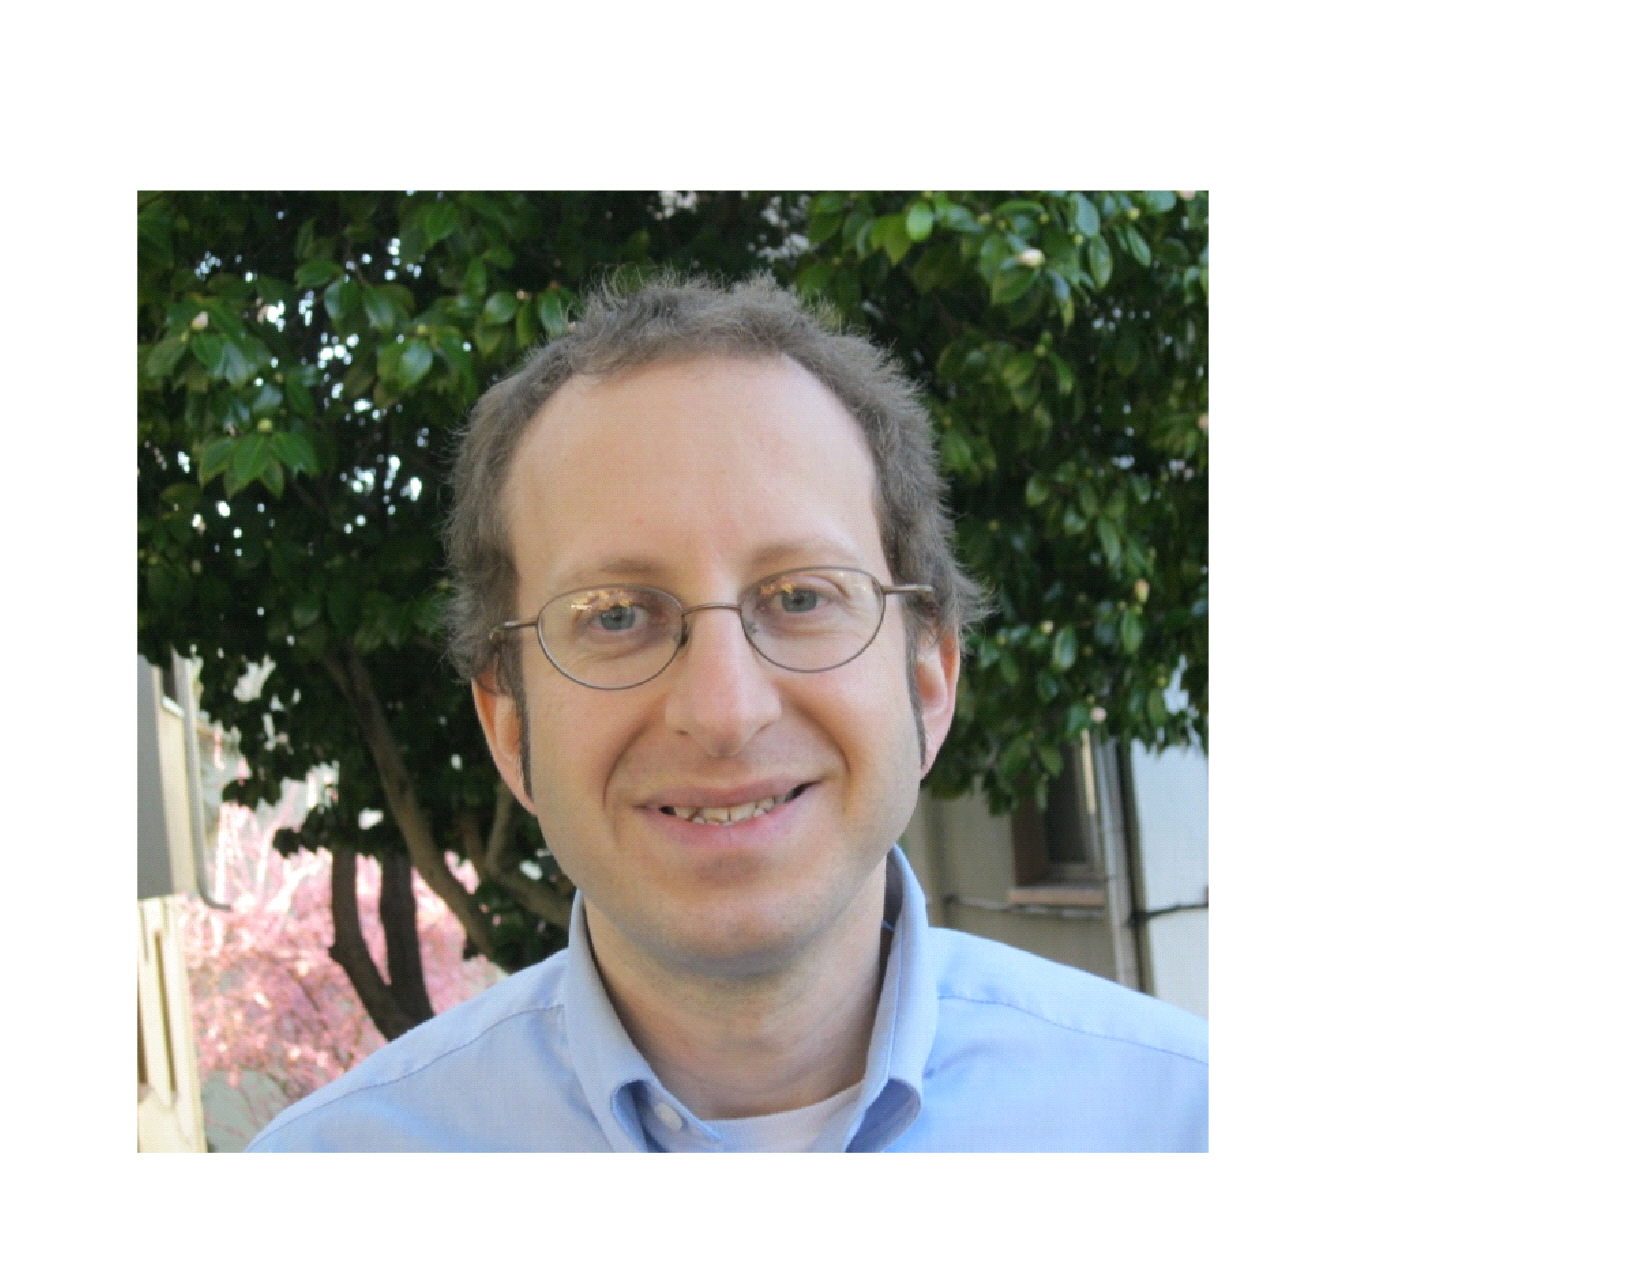 Gabriel Steinfeld, proofreading